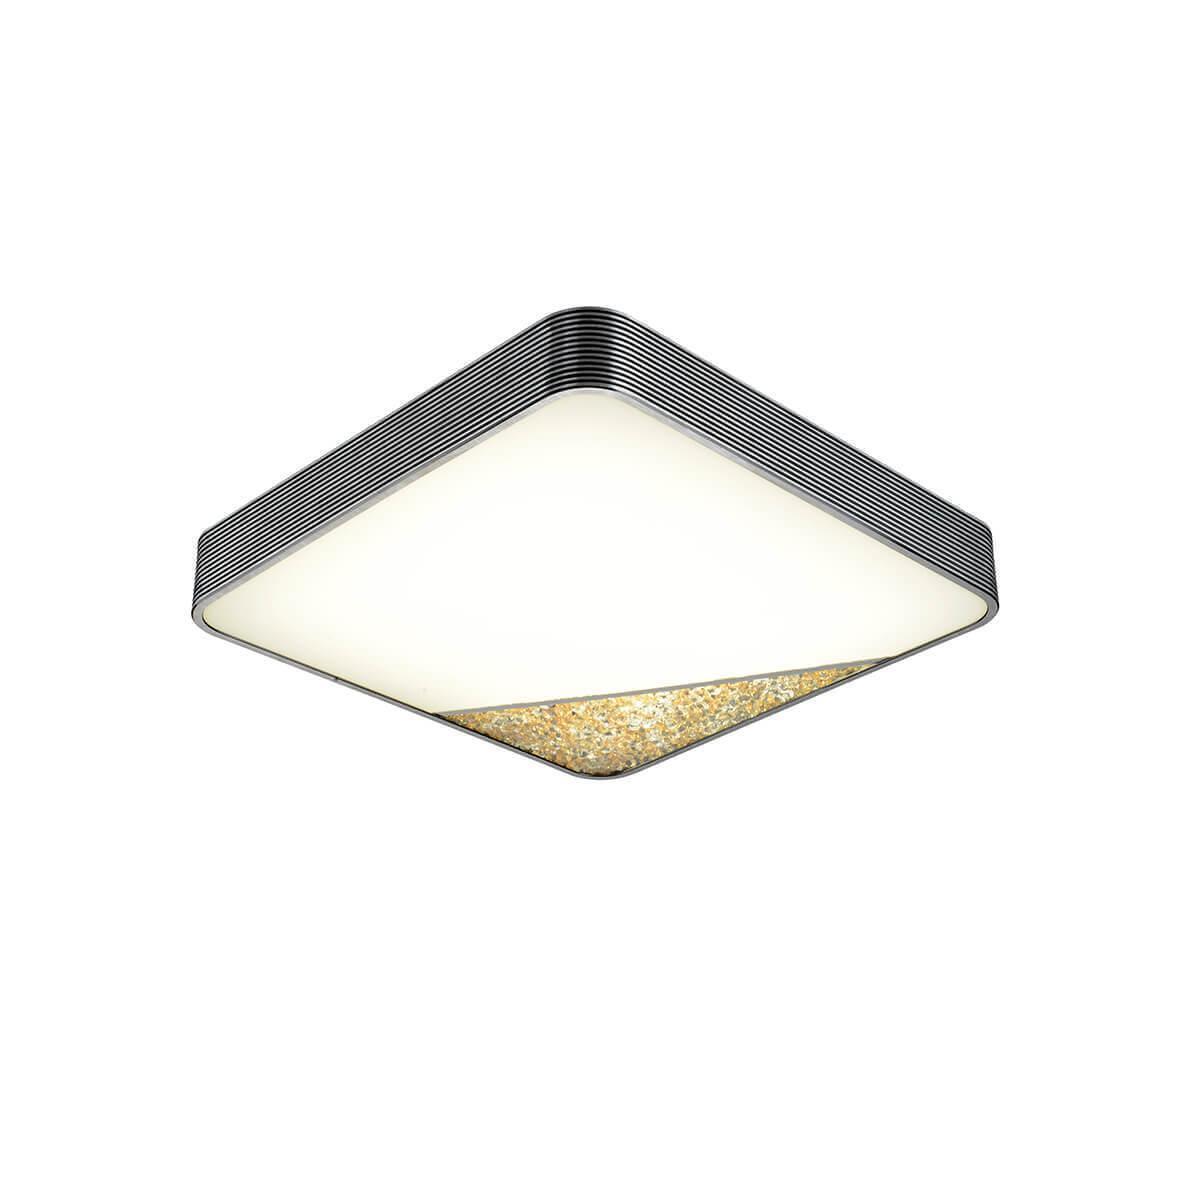 Накладной светильник Omnilux OML-45617-80, LED, 10 Вт